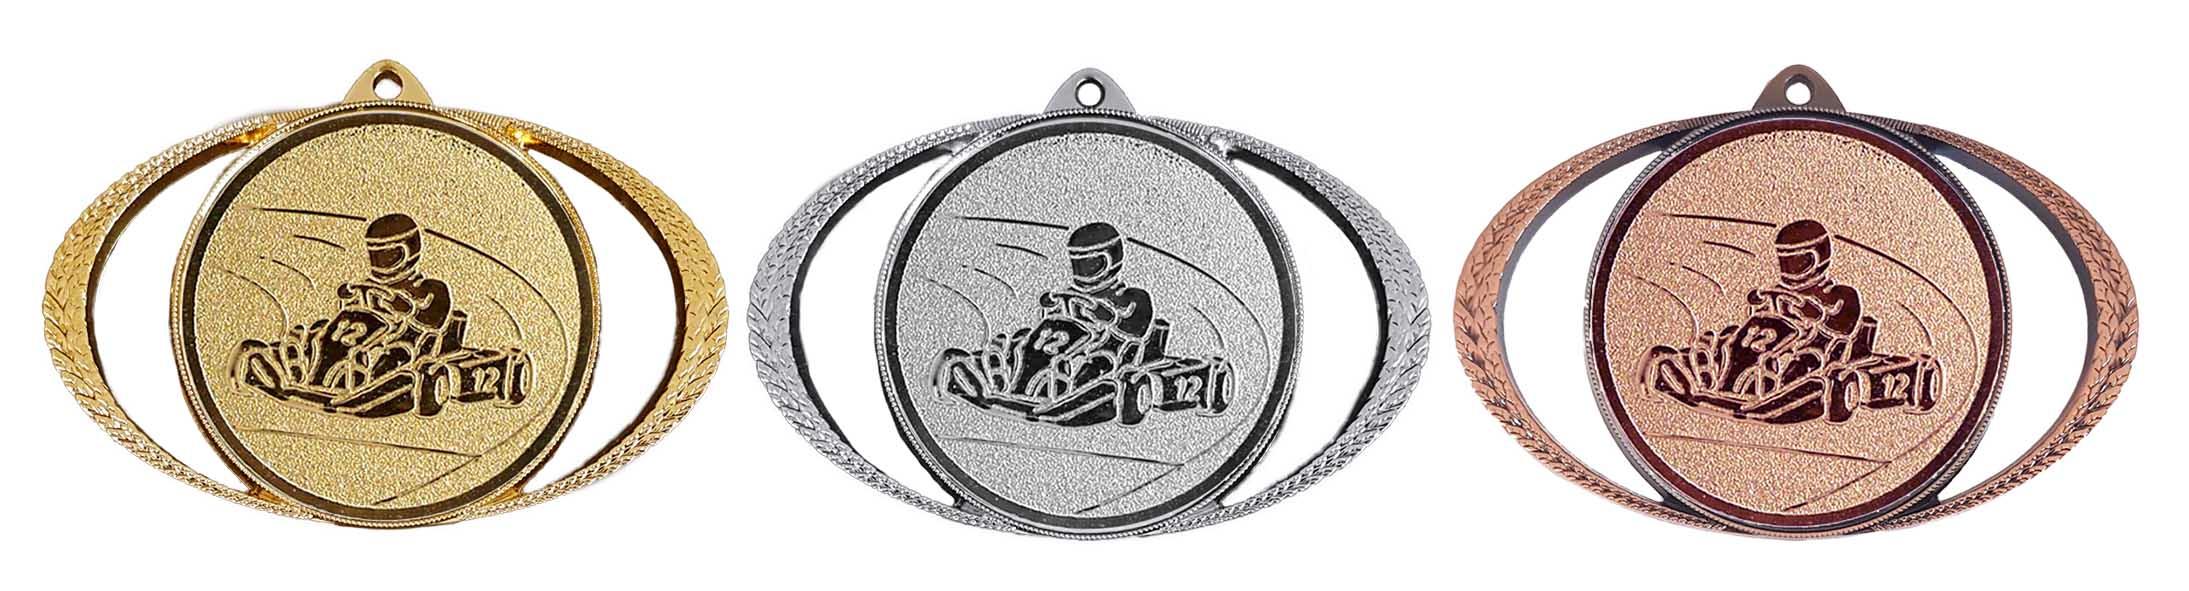 Medaille BS001